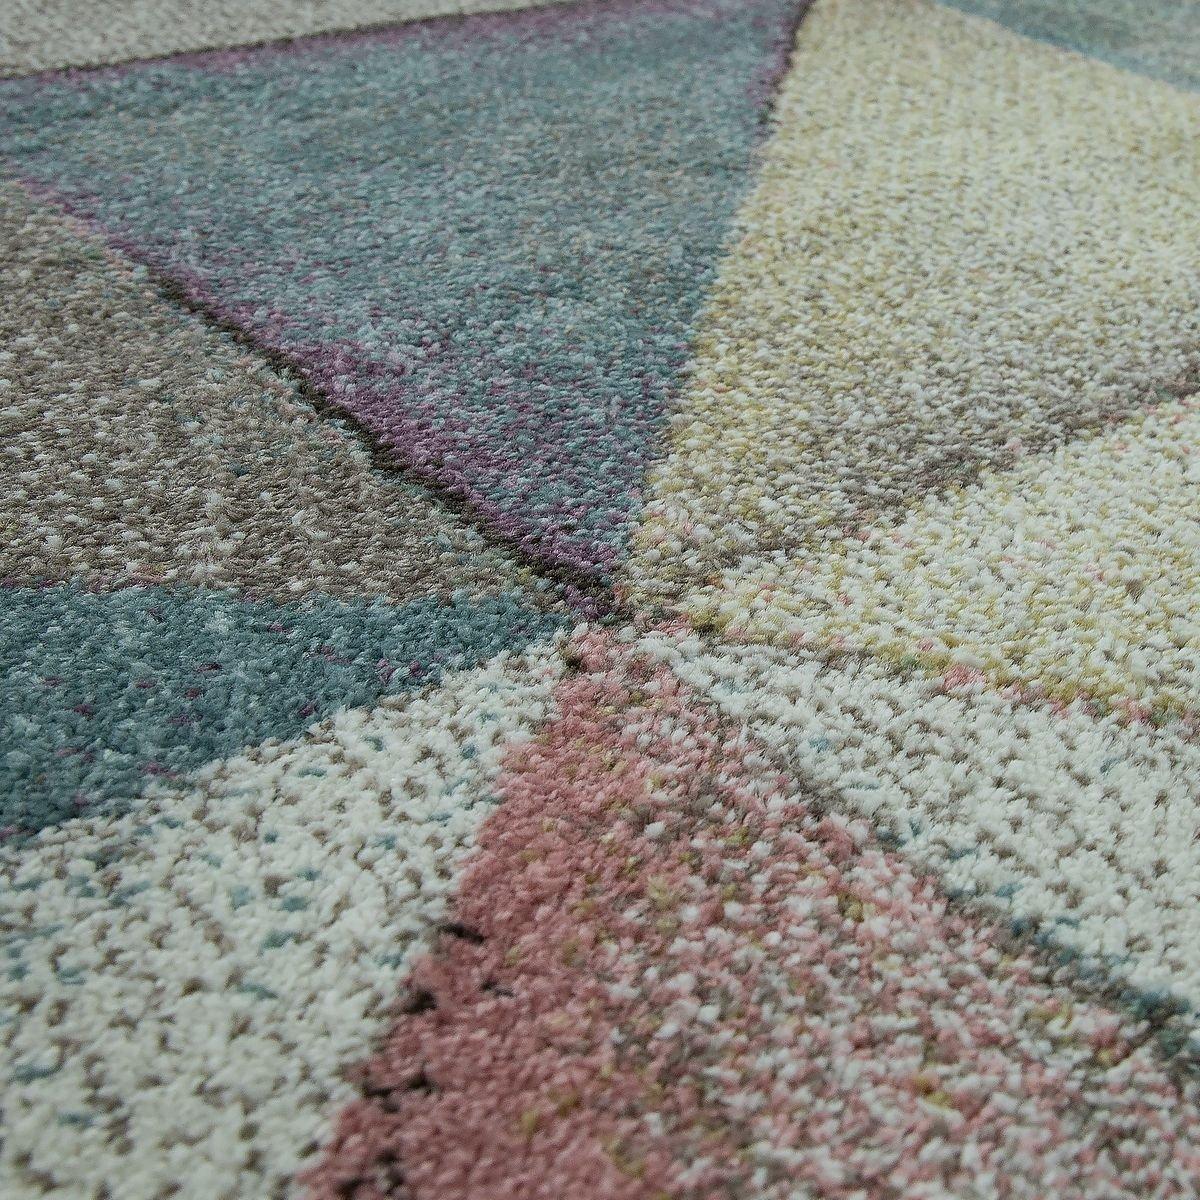 TT Home Moderner Kurzflor Teppich Pastellfarben Pastellfarben Pastellfarben Geometrisches Design Multicolor Bunt, Größe 120x170 cm 953a28